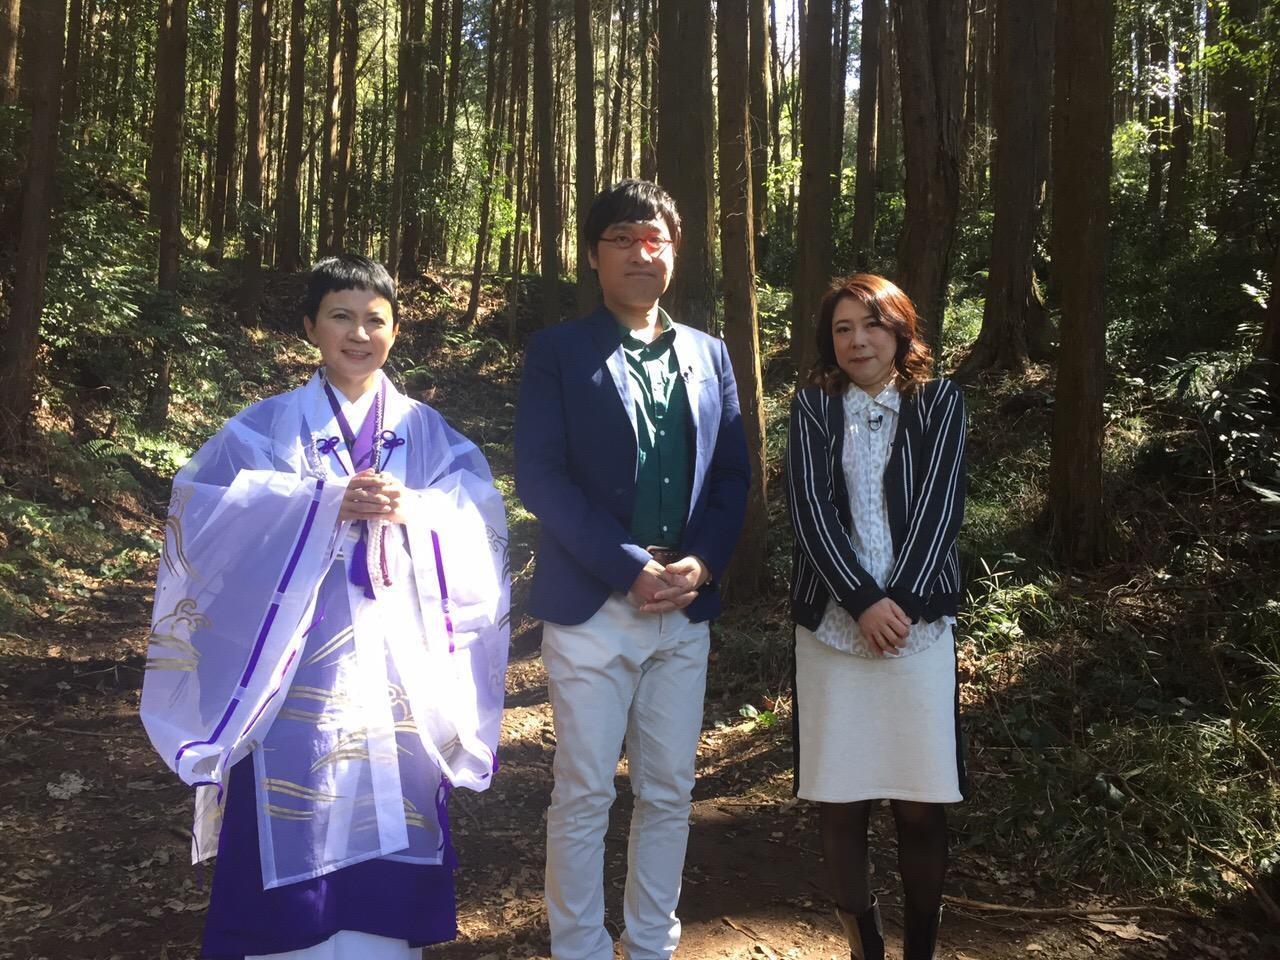 http://news.yoshimoto.co.jp/20170428172343-f12d5ef4e47d39d8ed87a5c368fefd8737a885c8.jpg